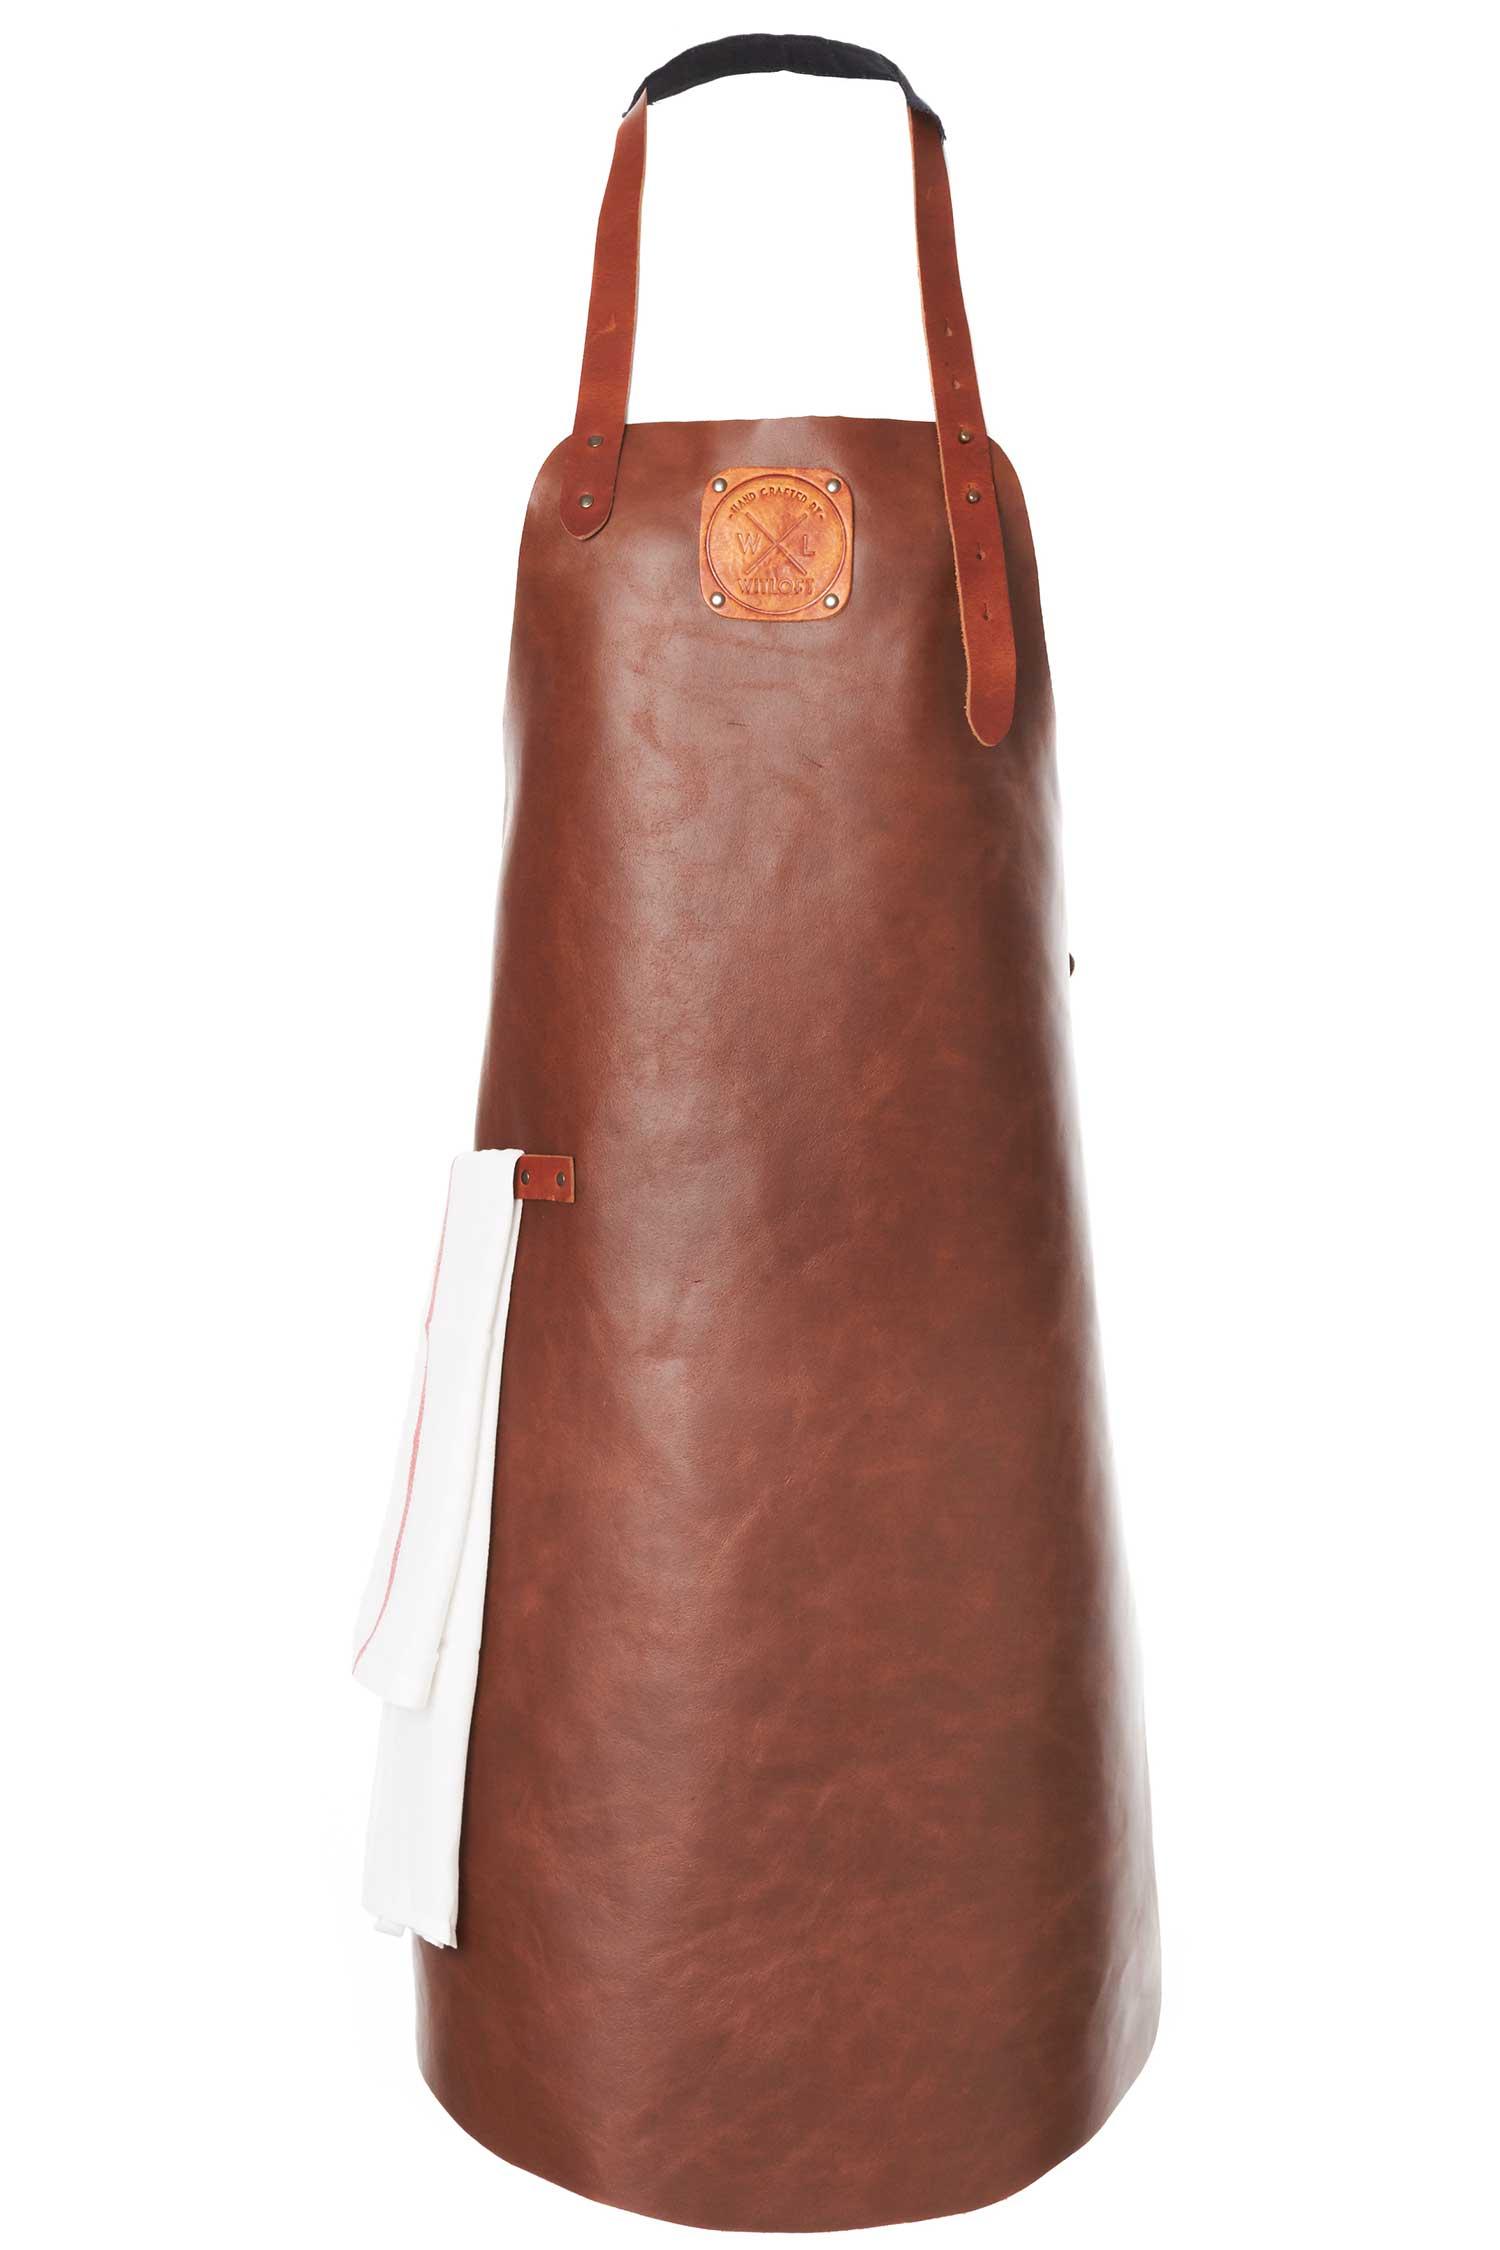 Witloft apron classic collection cognac colored with a cognac strap